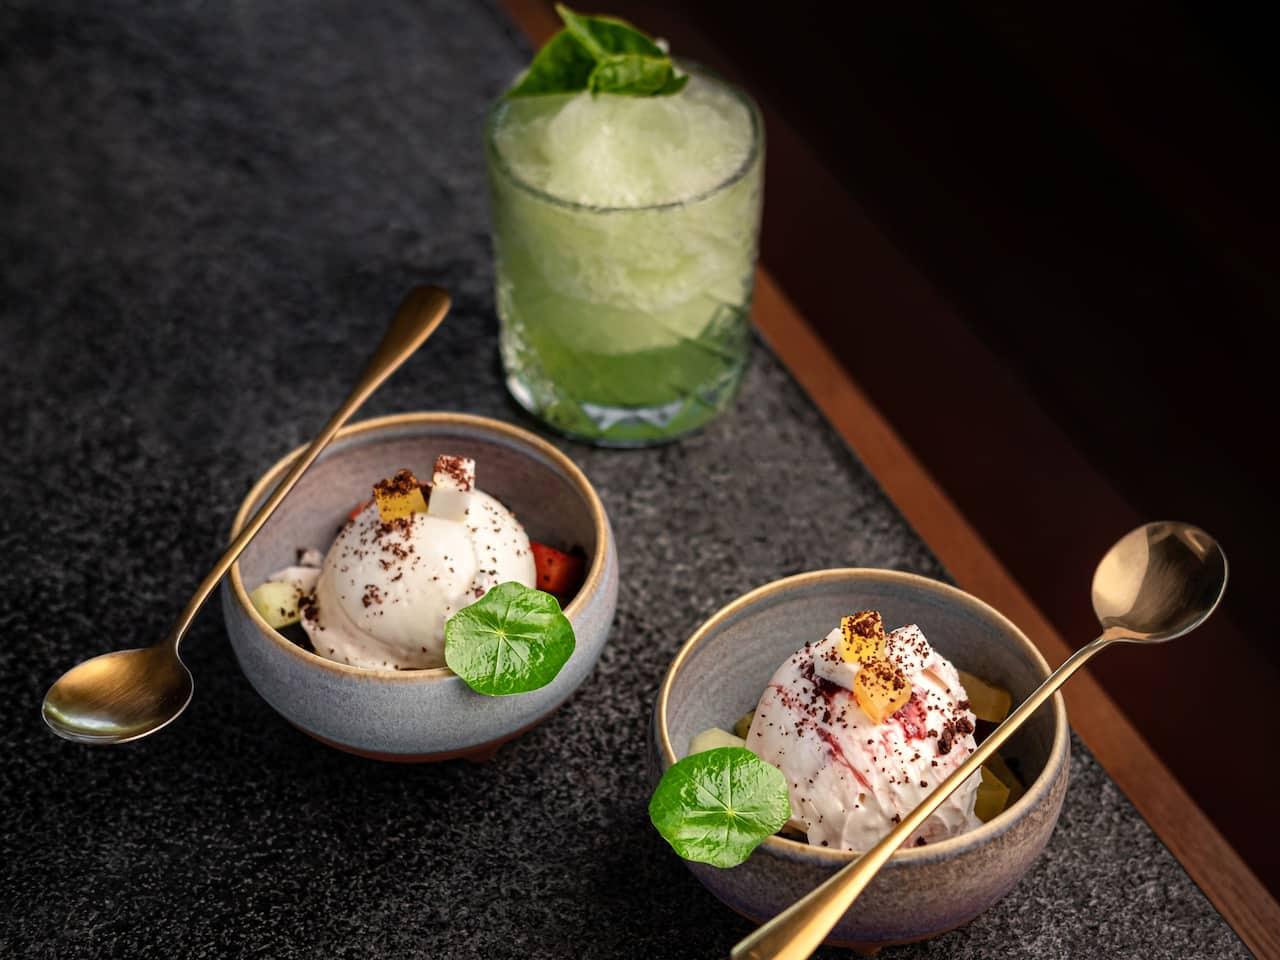 Veranda Lounge and Bar Nusa Dua Bali, Grand Hyatt